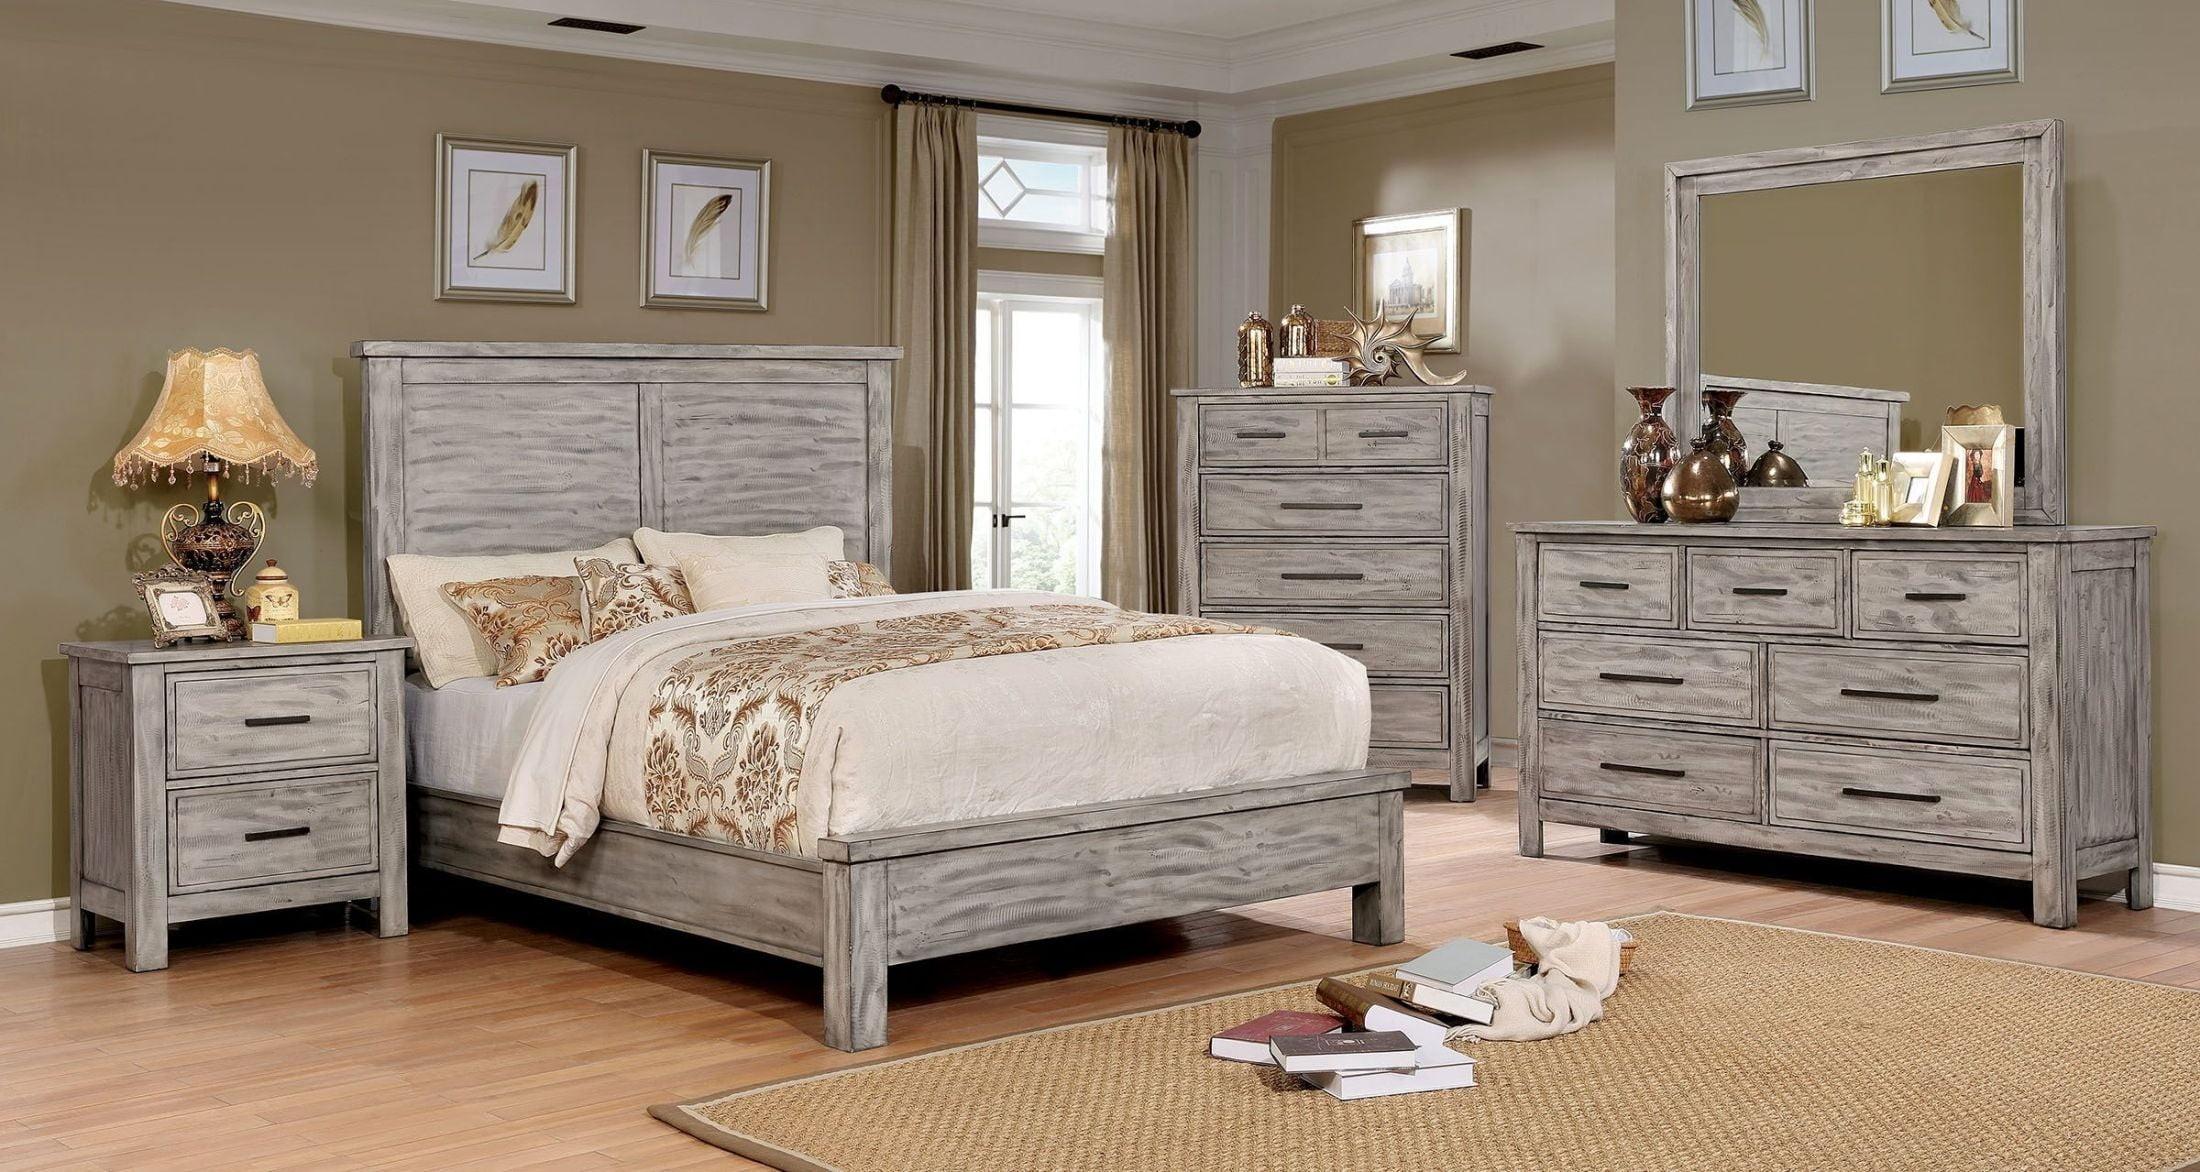 Grey Vintage Bedroom: Canopus Antique Gray Dresser